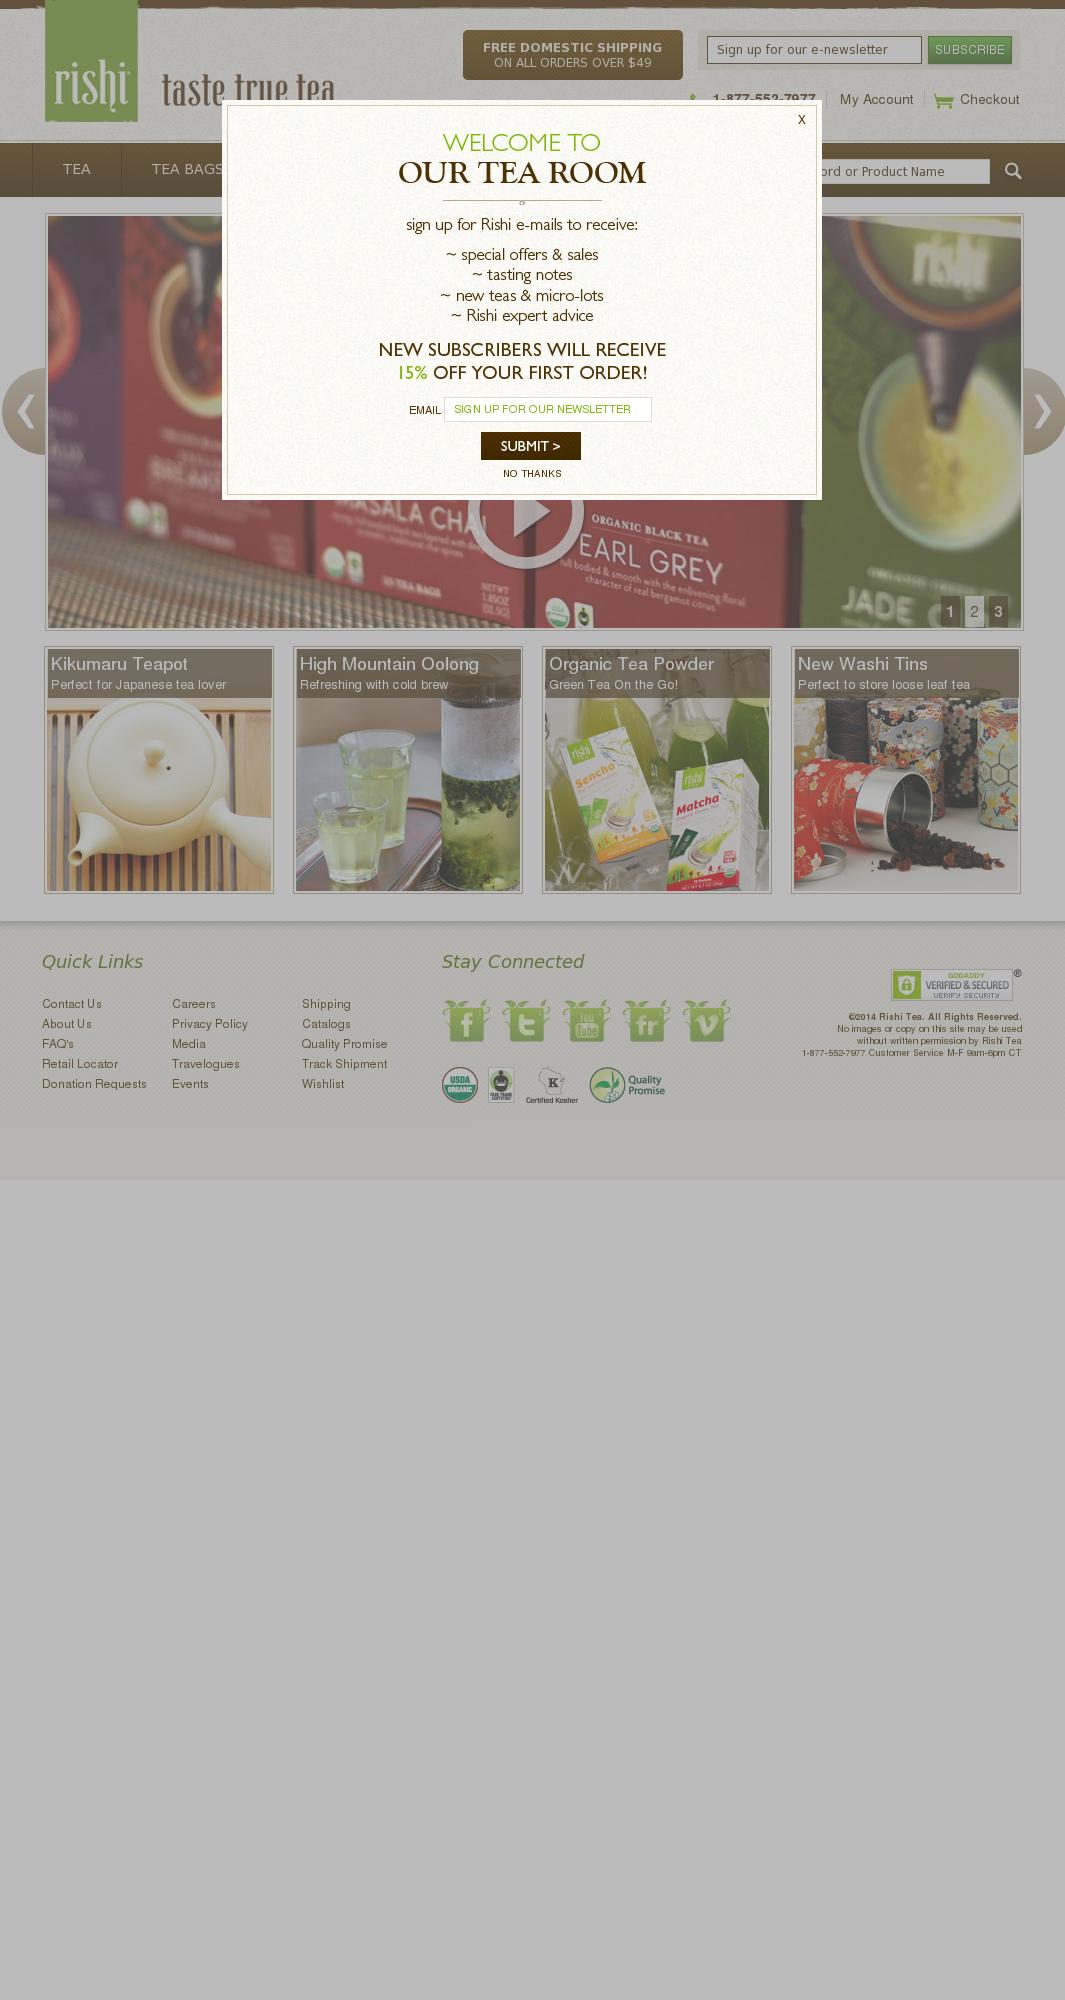 Rishi Tea Competitors, Revenue and Employees - Owler Company Profile